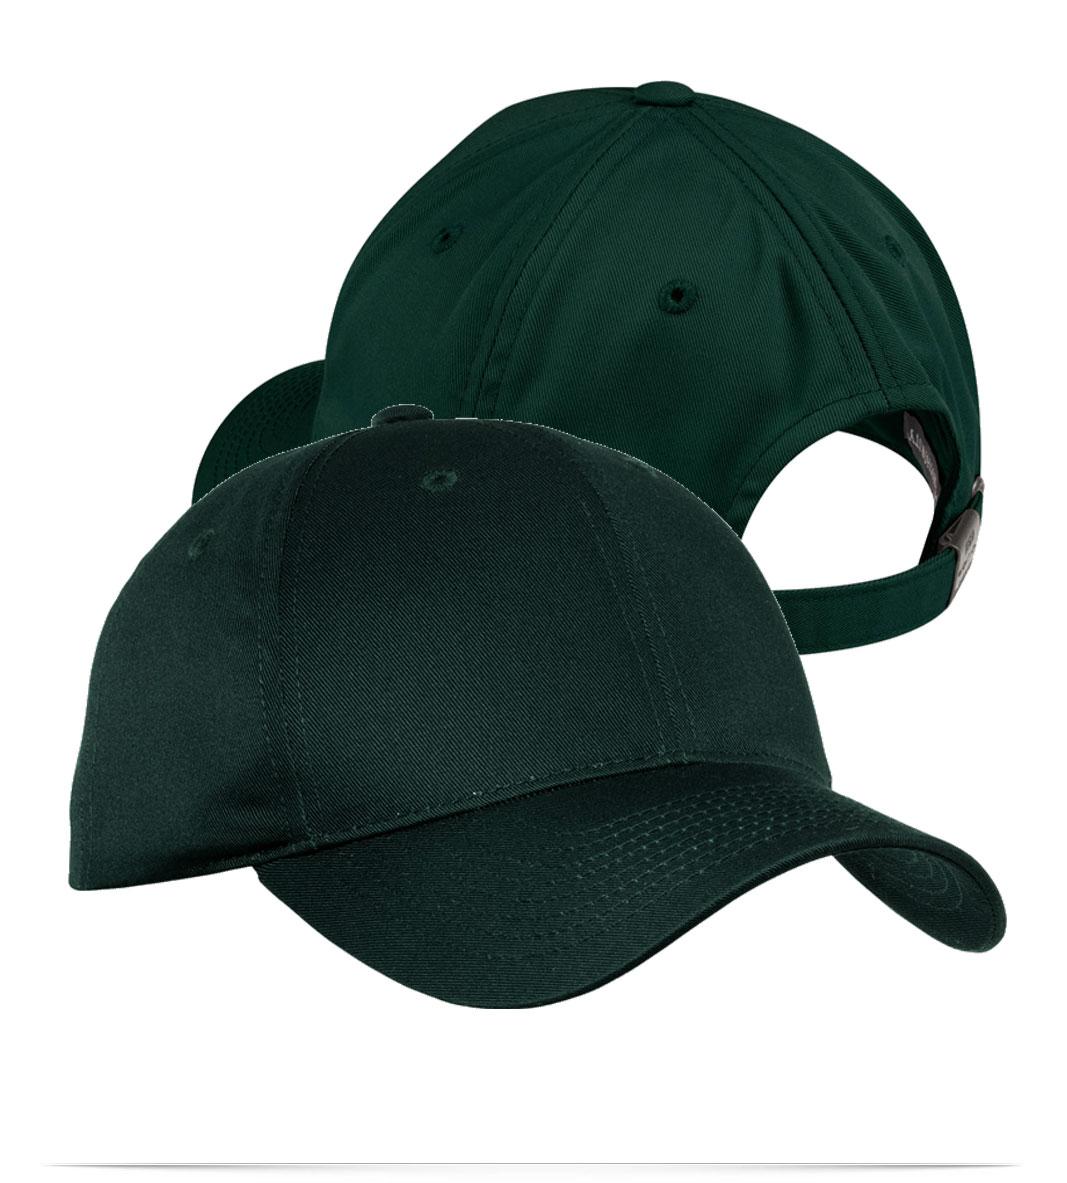 Customize Pro StyleTwill Cap